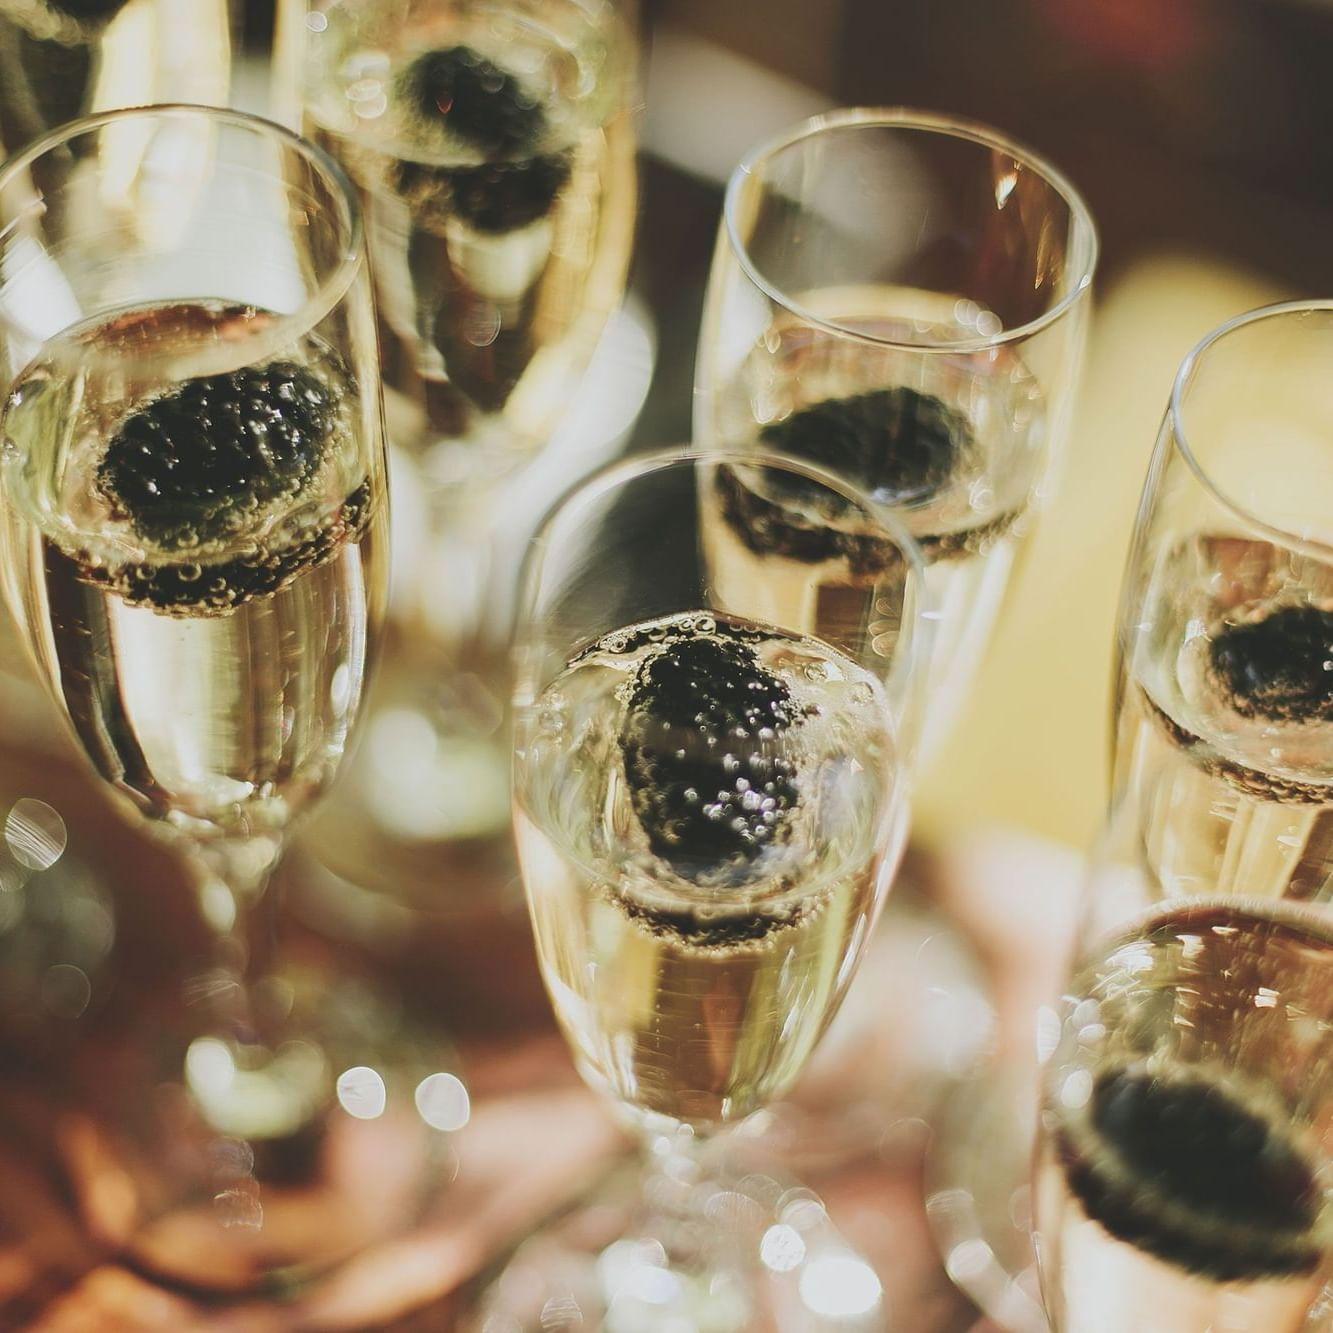 Champagne tasting at the Marbella Club